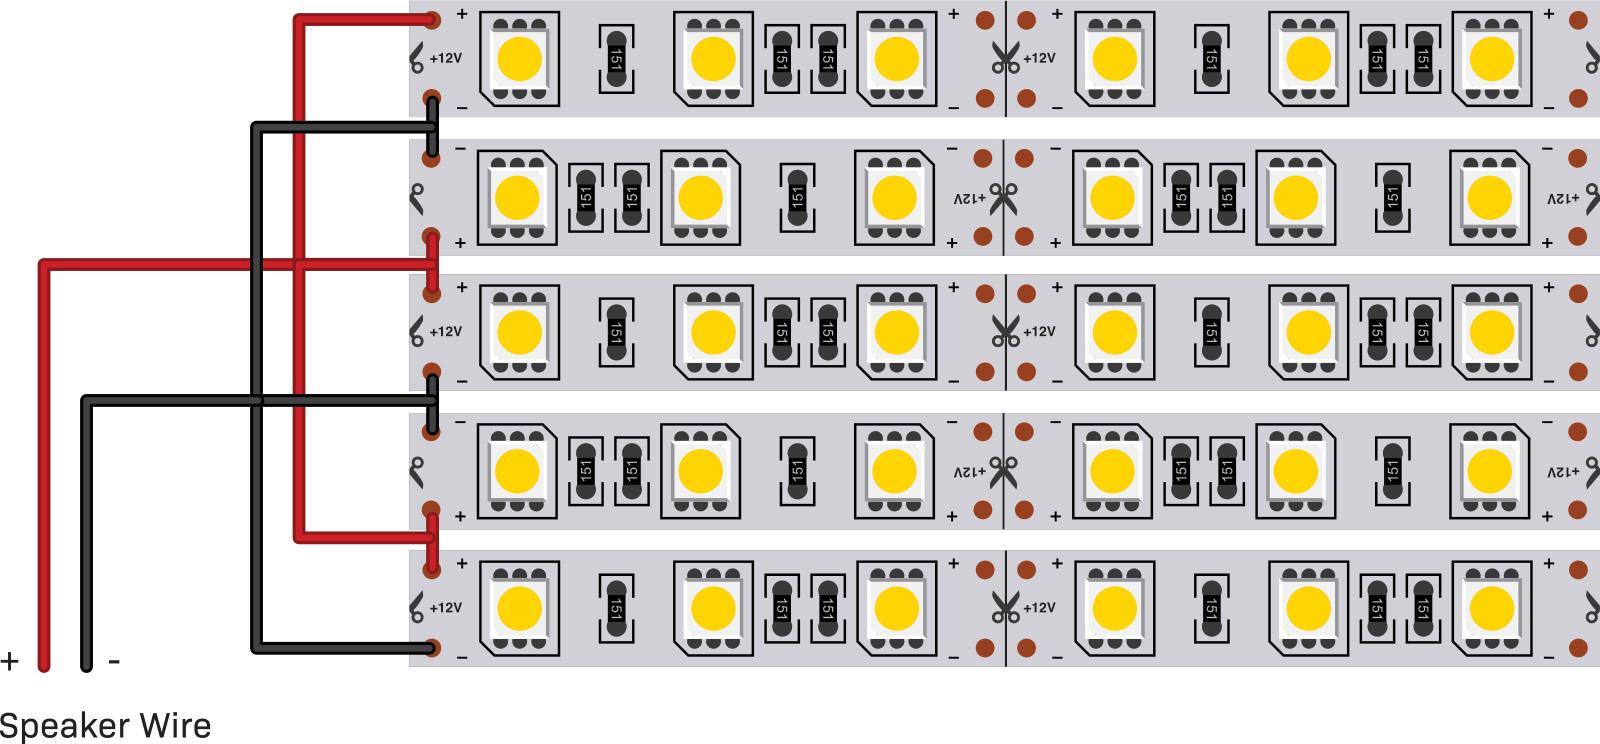 Super Size Me Led Vu Meter Diyode Magazine Audio Spectrum Analyzer Circuit 400led Speaker Wire Diagram